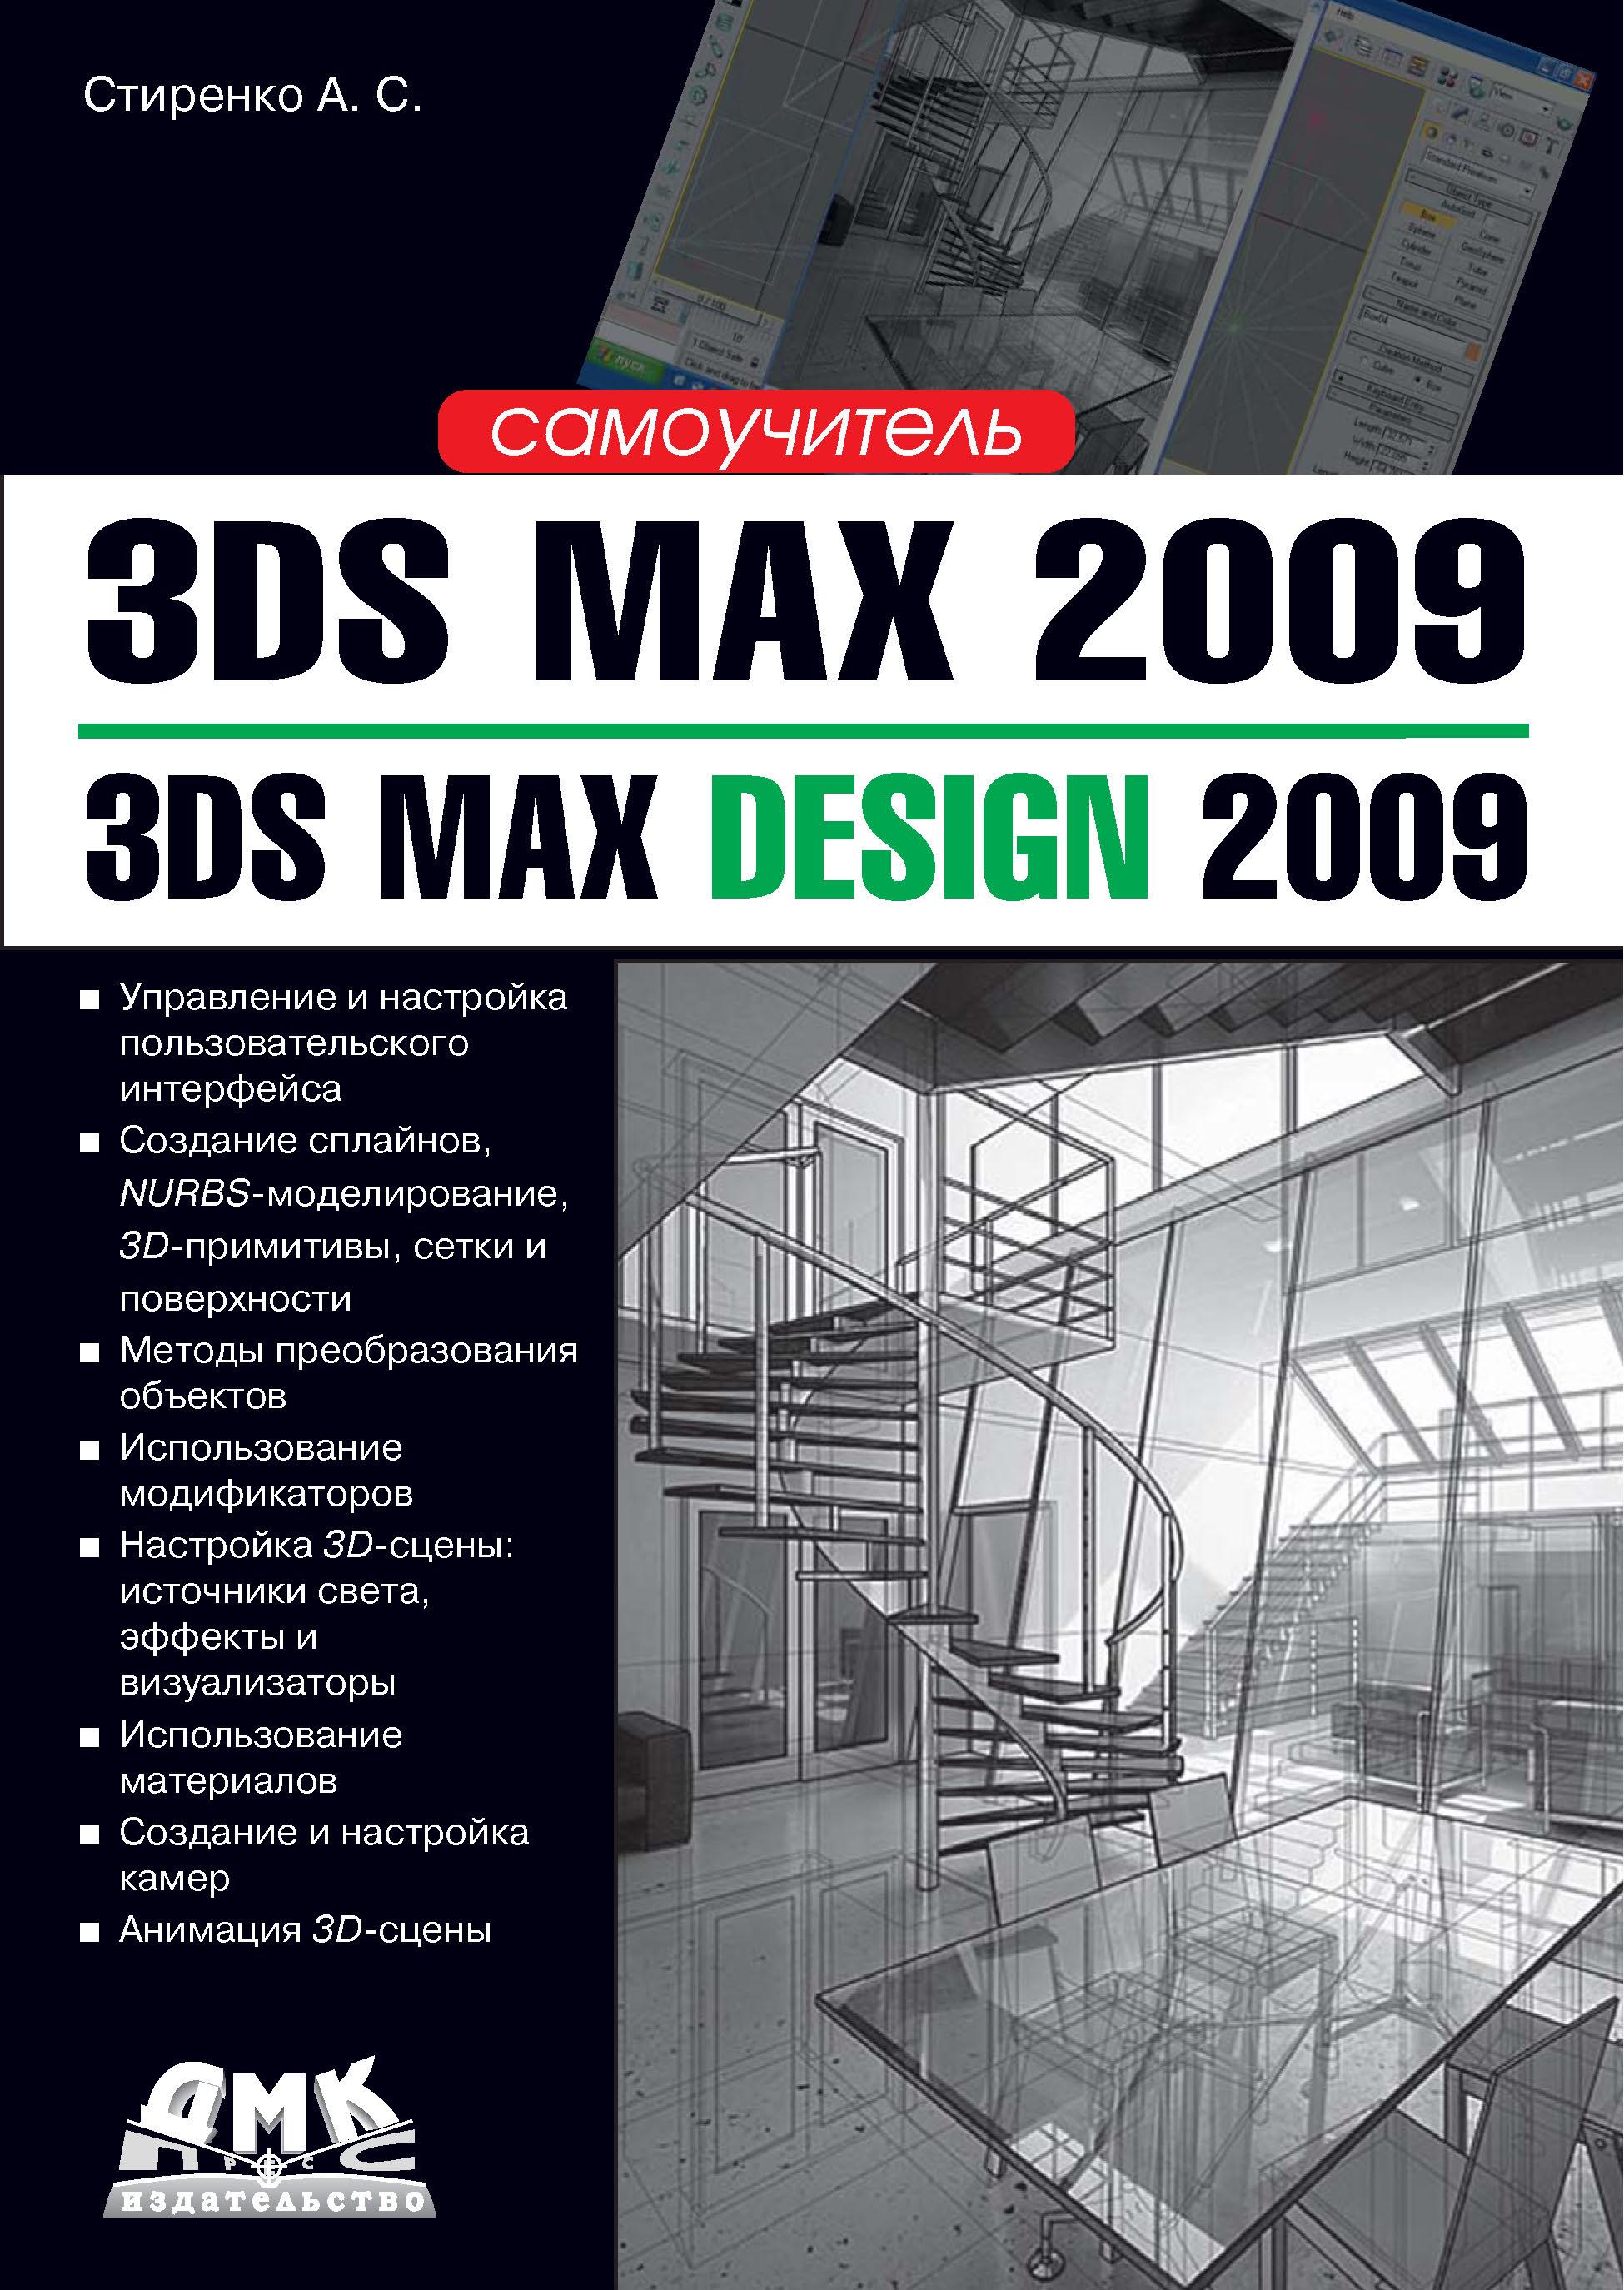 А. С. Стиренко 3ds Max 2009 / 3ds Max Design 2009. Самоучитель kelly l murdock 3ds max 2011 bible